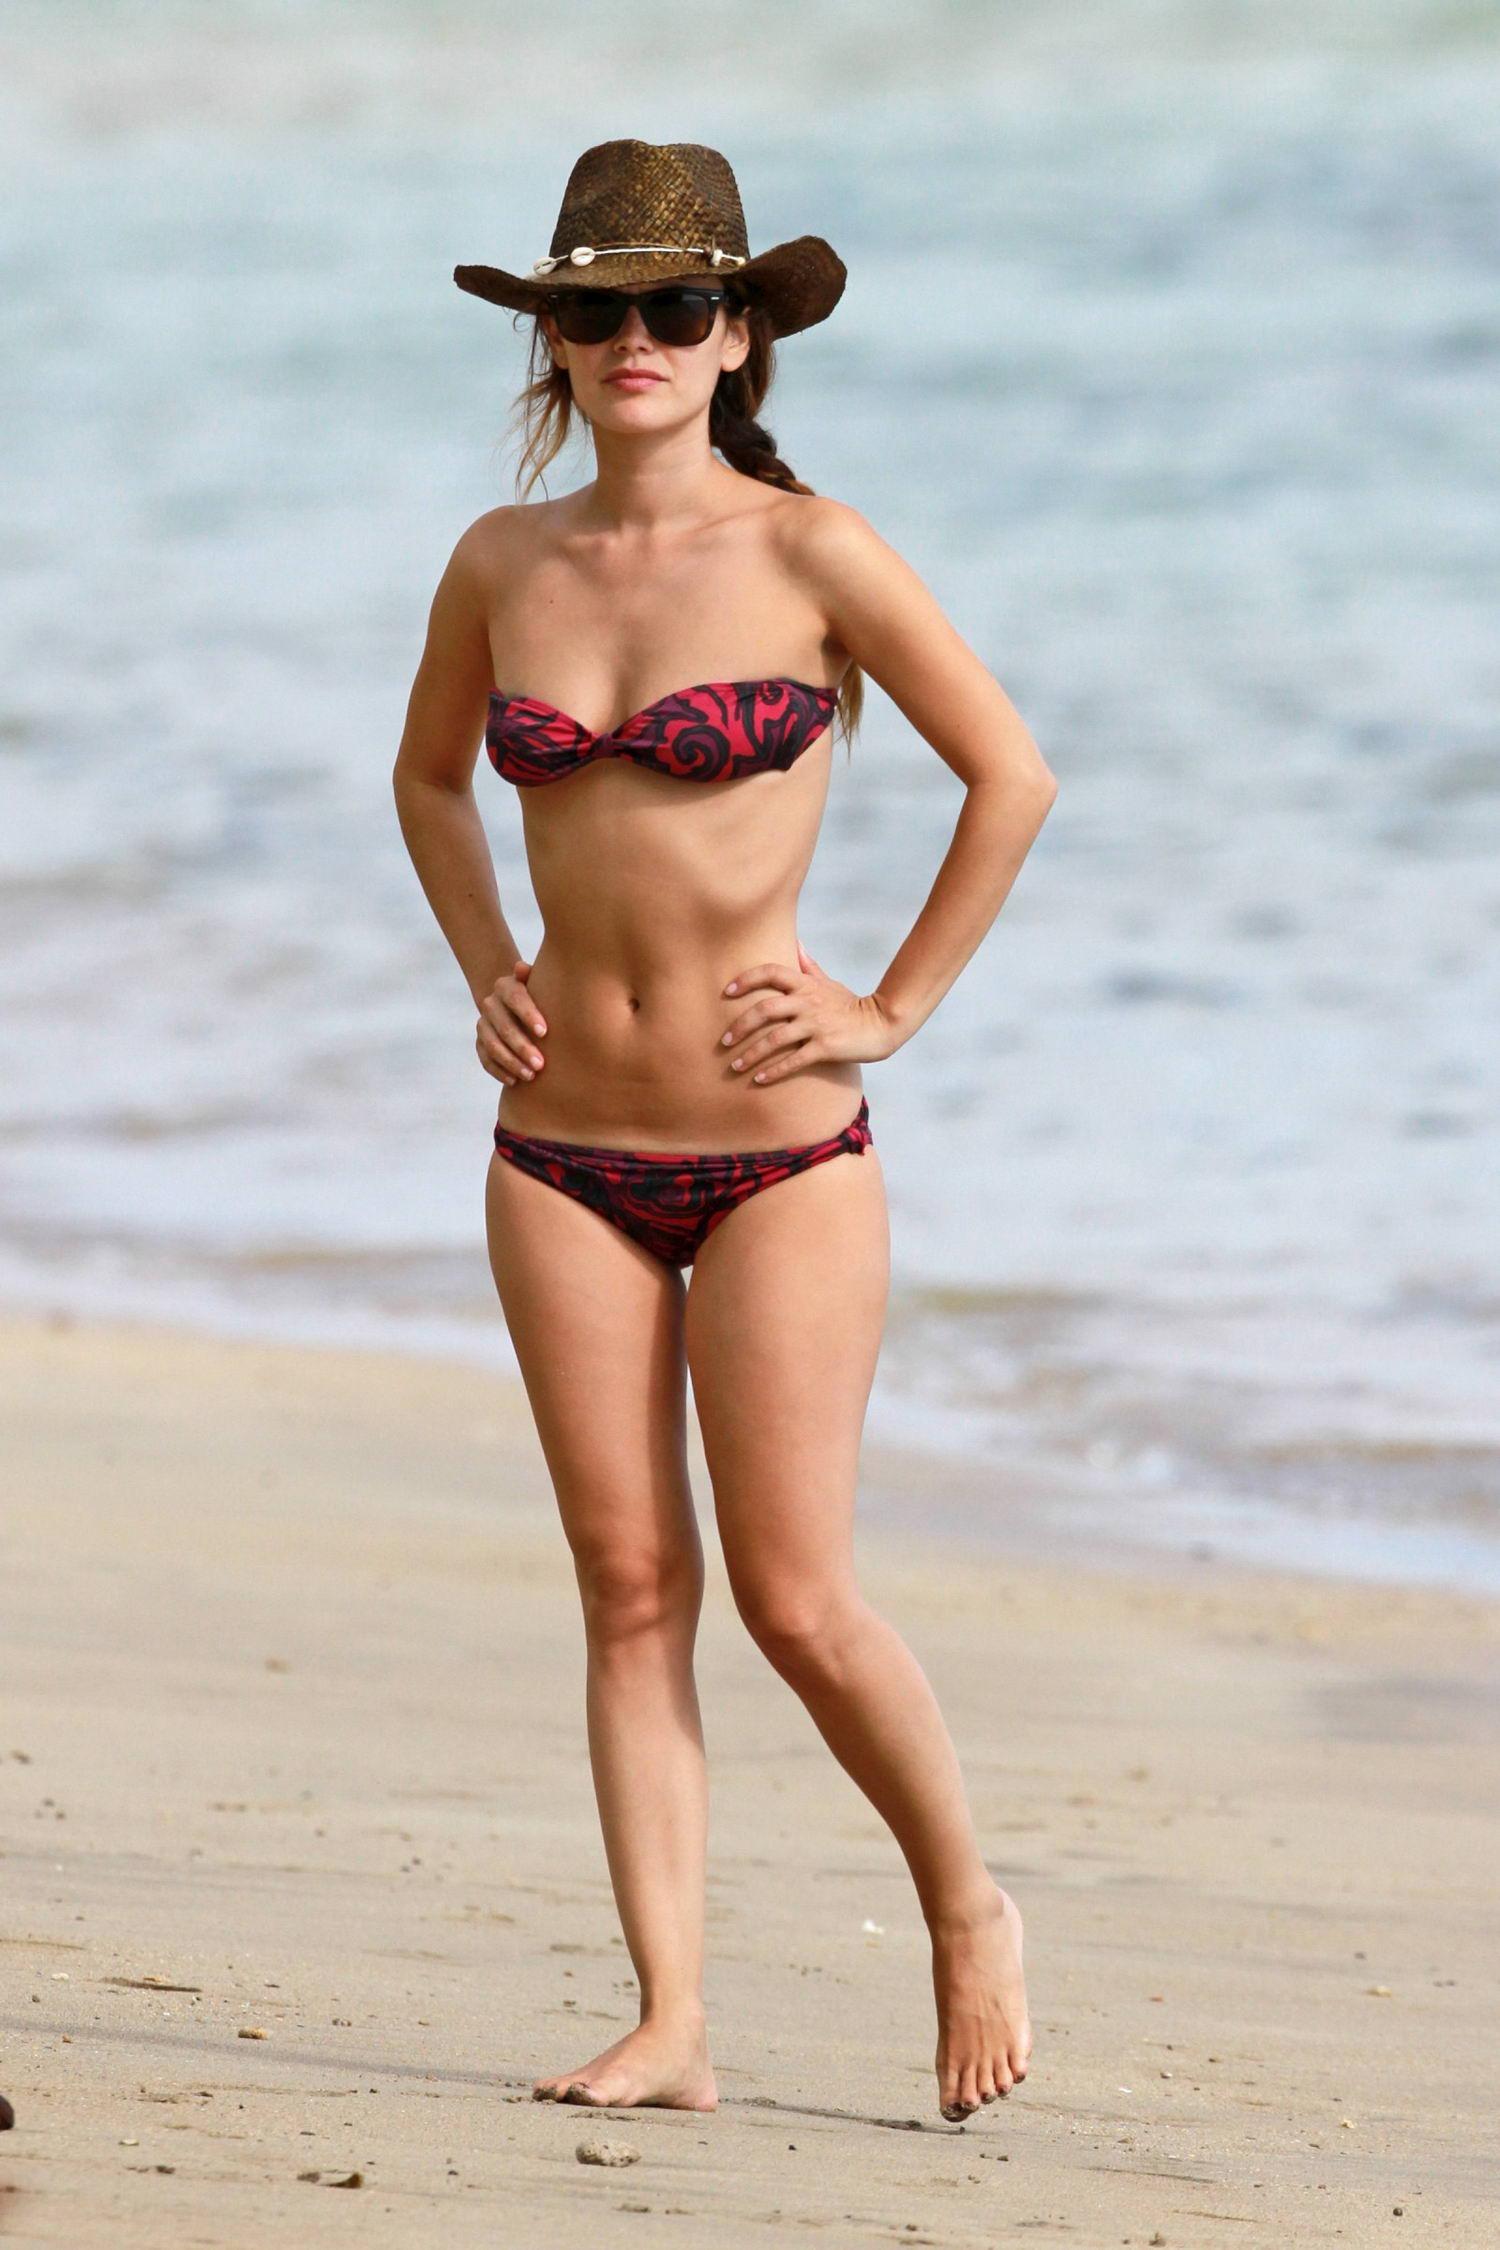 Rachel_Bilson_Bikini-1